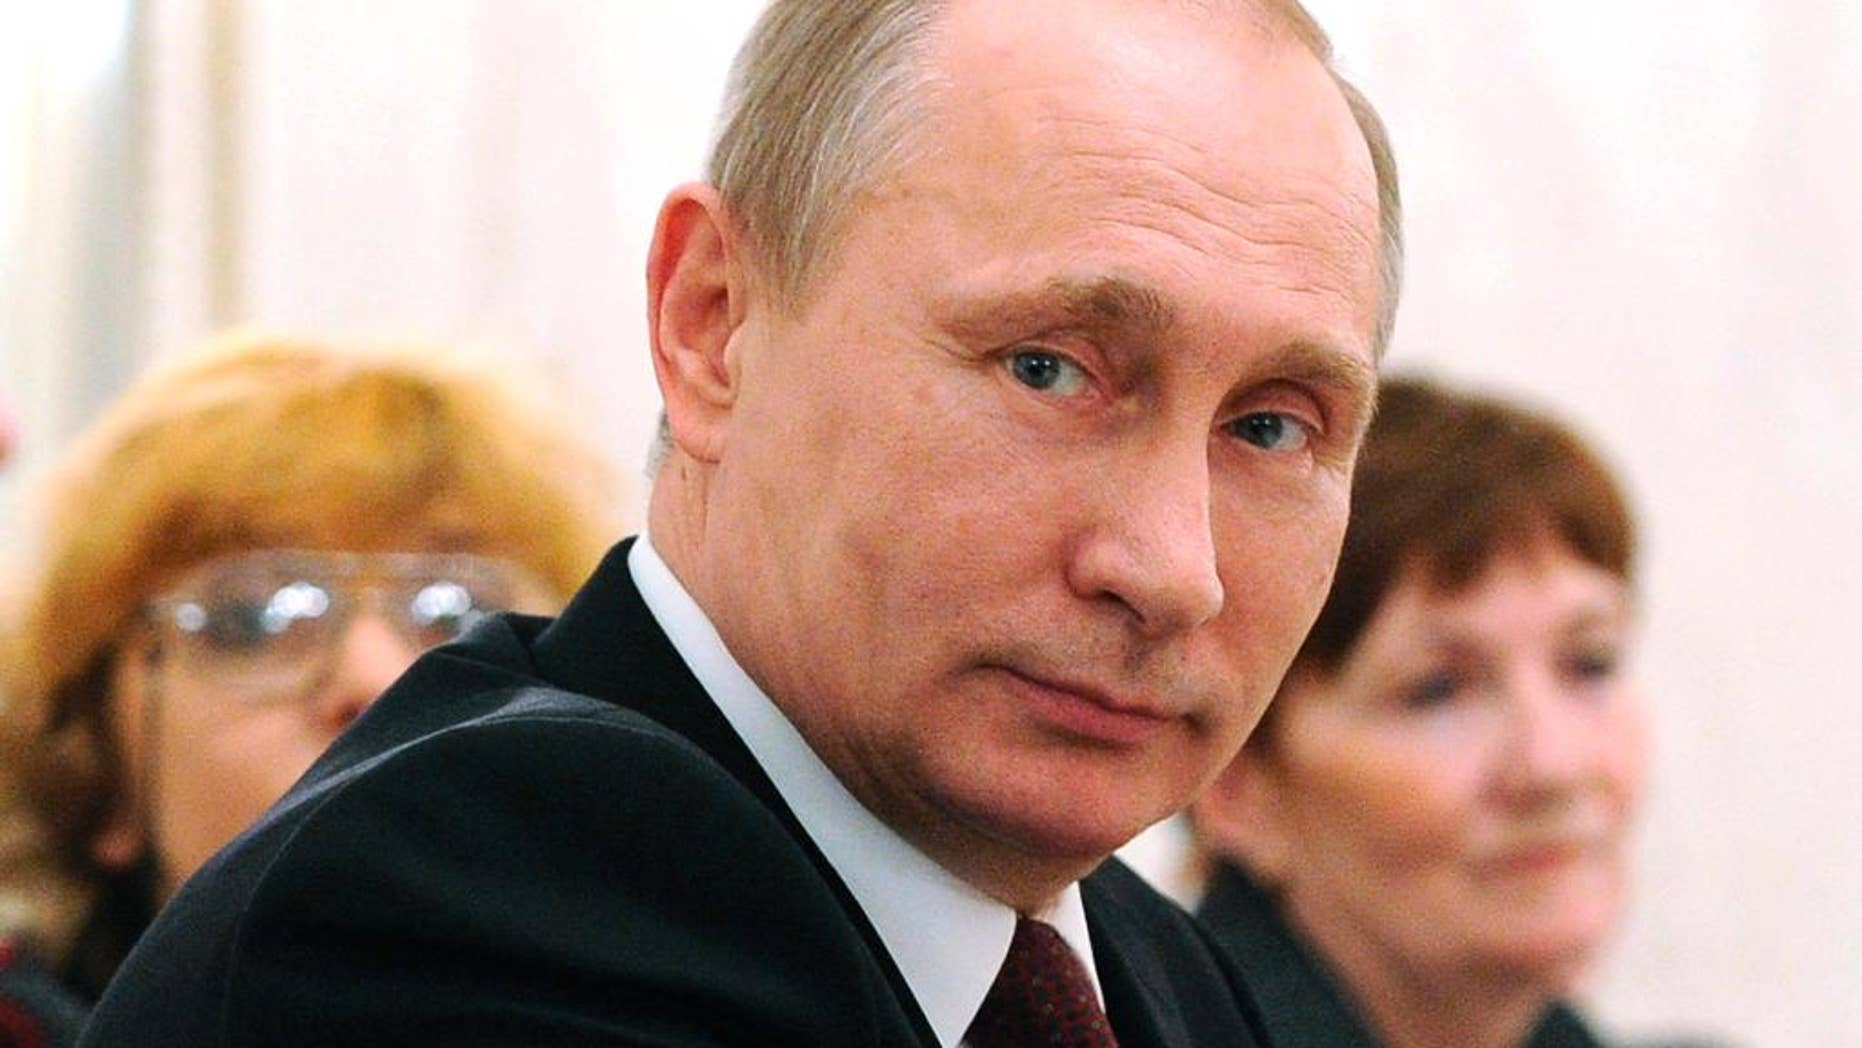 Russian President Vladimir Putin attends an International Women's Day celebration in the Kremlin, in Moscow, Russia, Sunday, March 8, 2015.  (AP Photo/RIA-Novosti, Mikhail Klimentyev, Presidential Press Service)